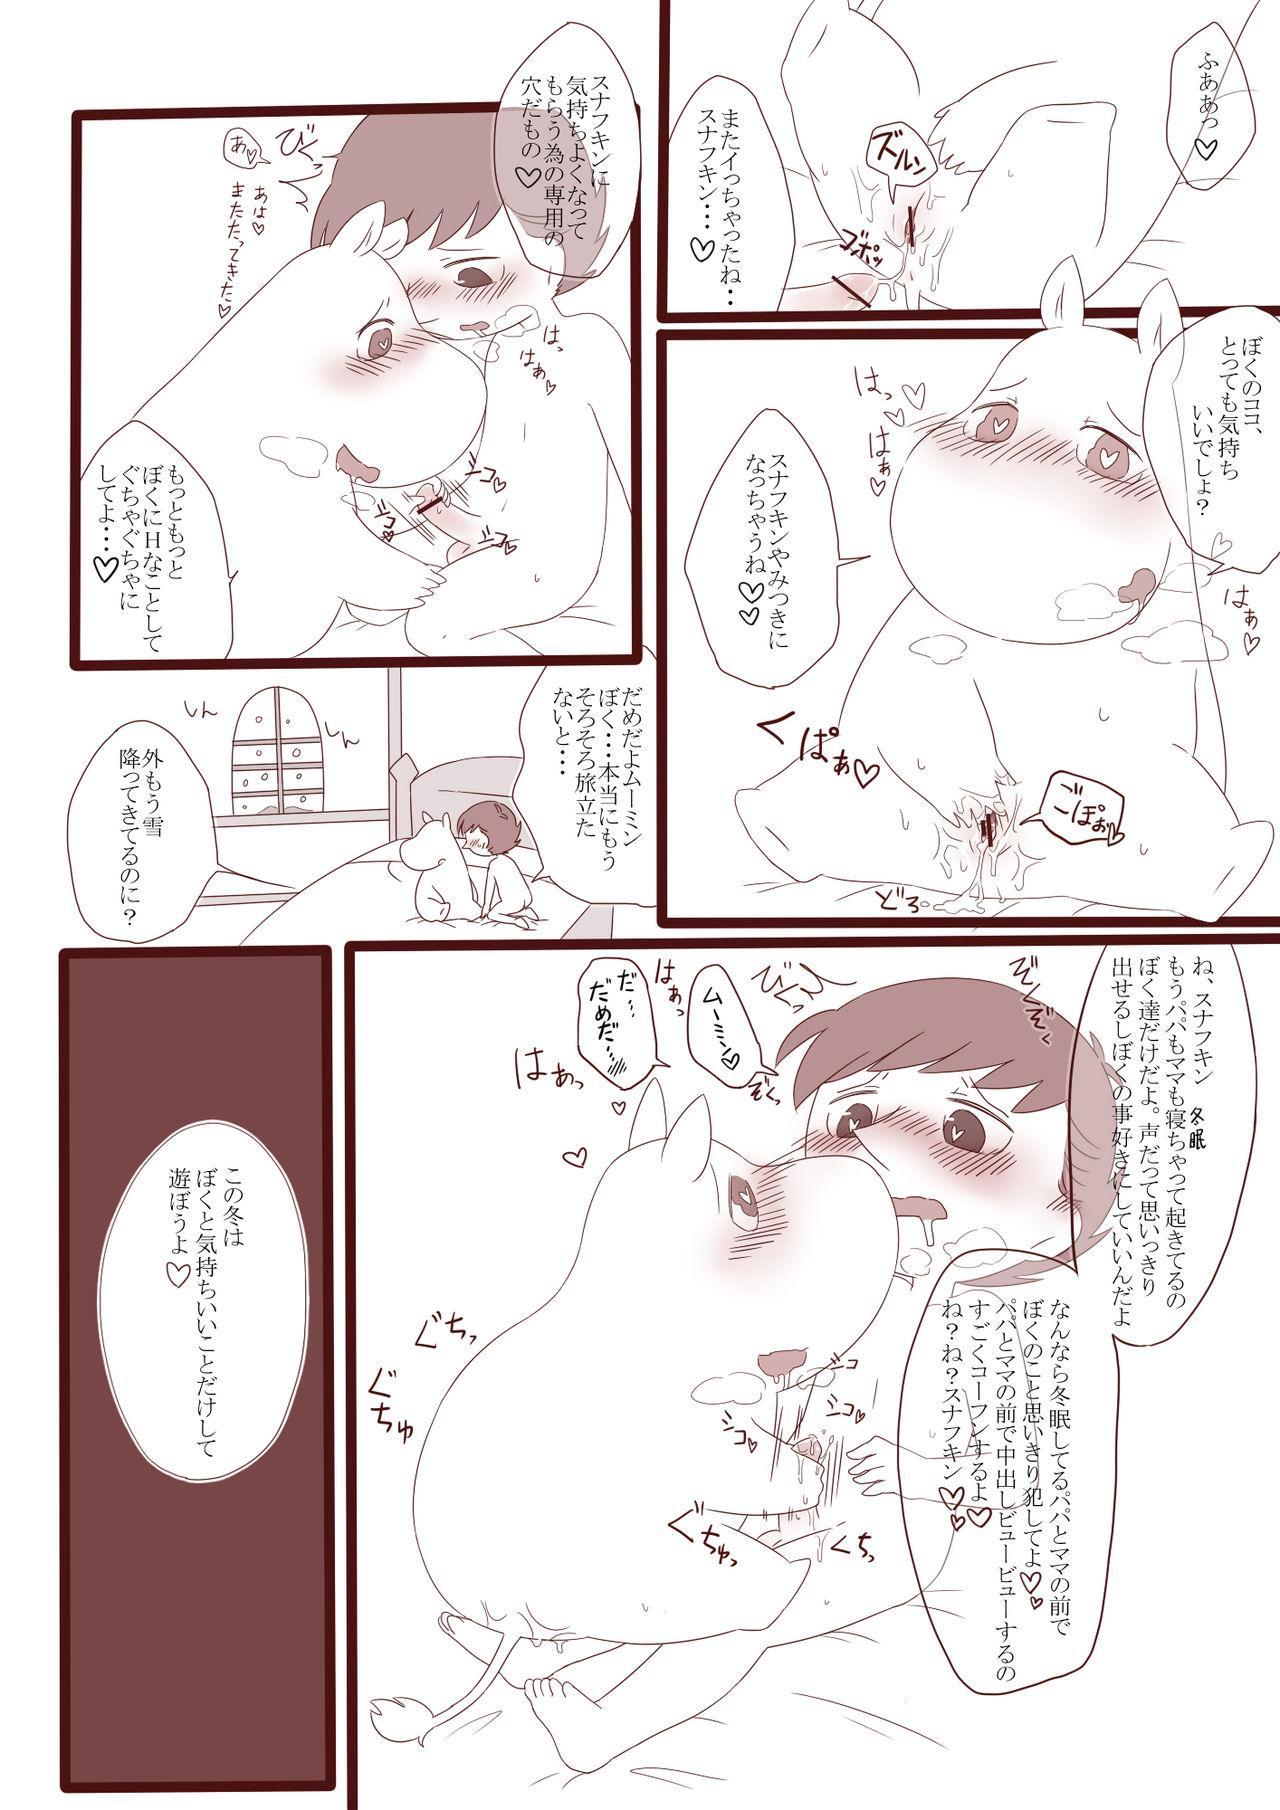 Moomin and Snufkin 2